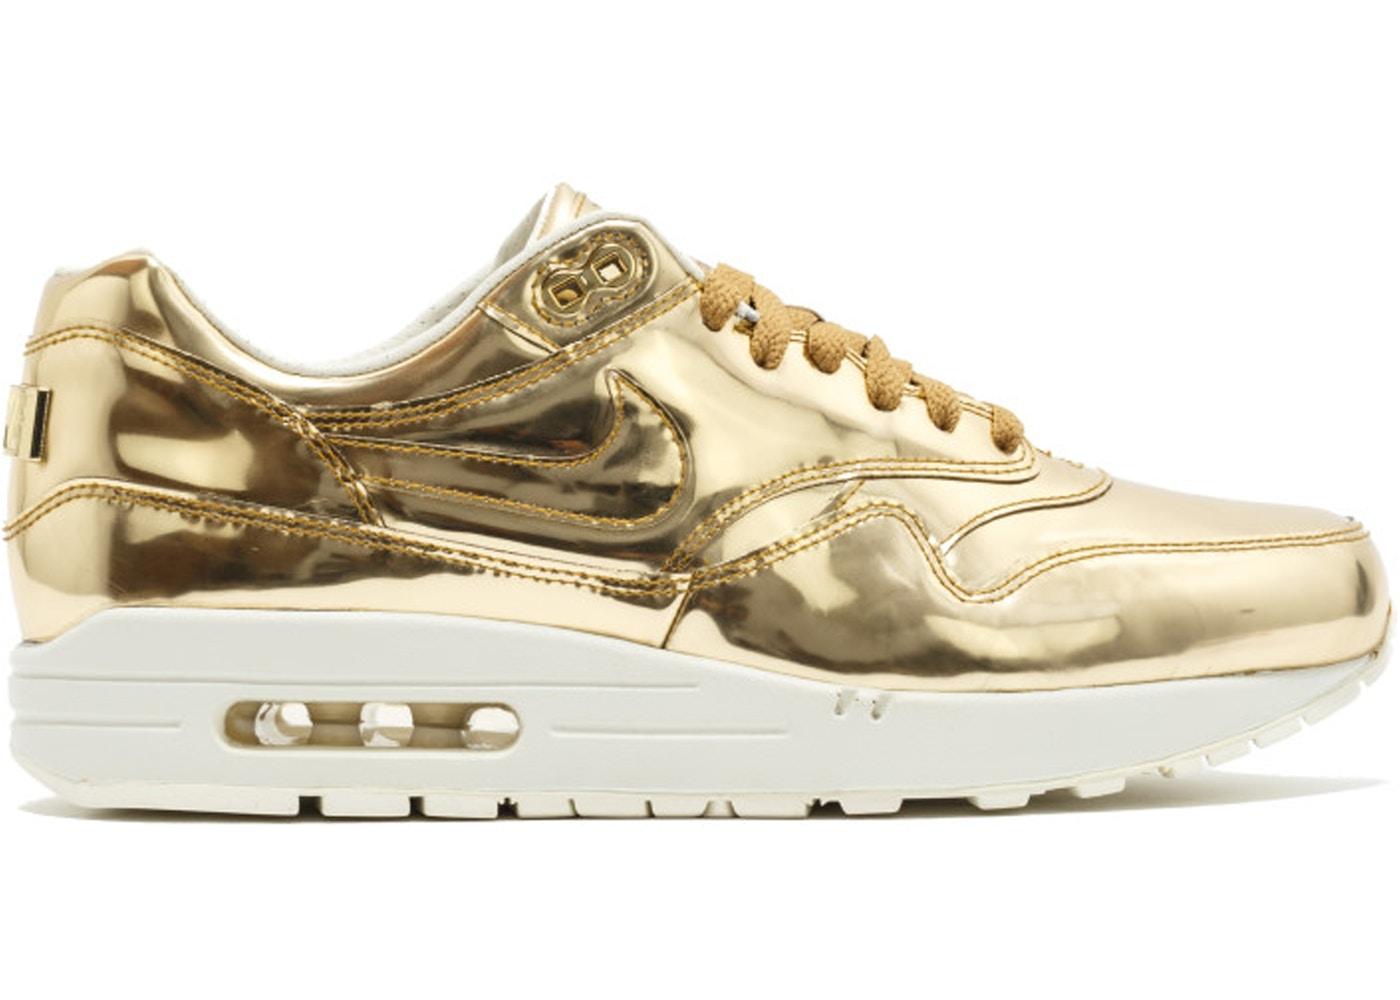 Air Max 1 'Liquid Gold' sneakers